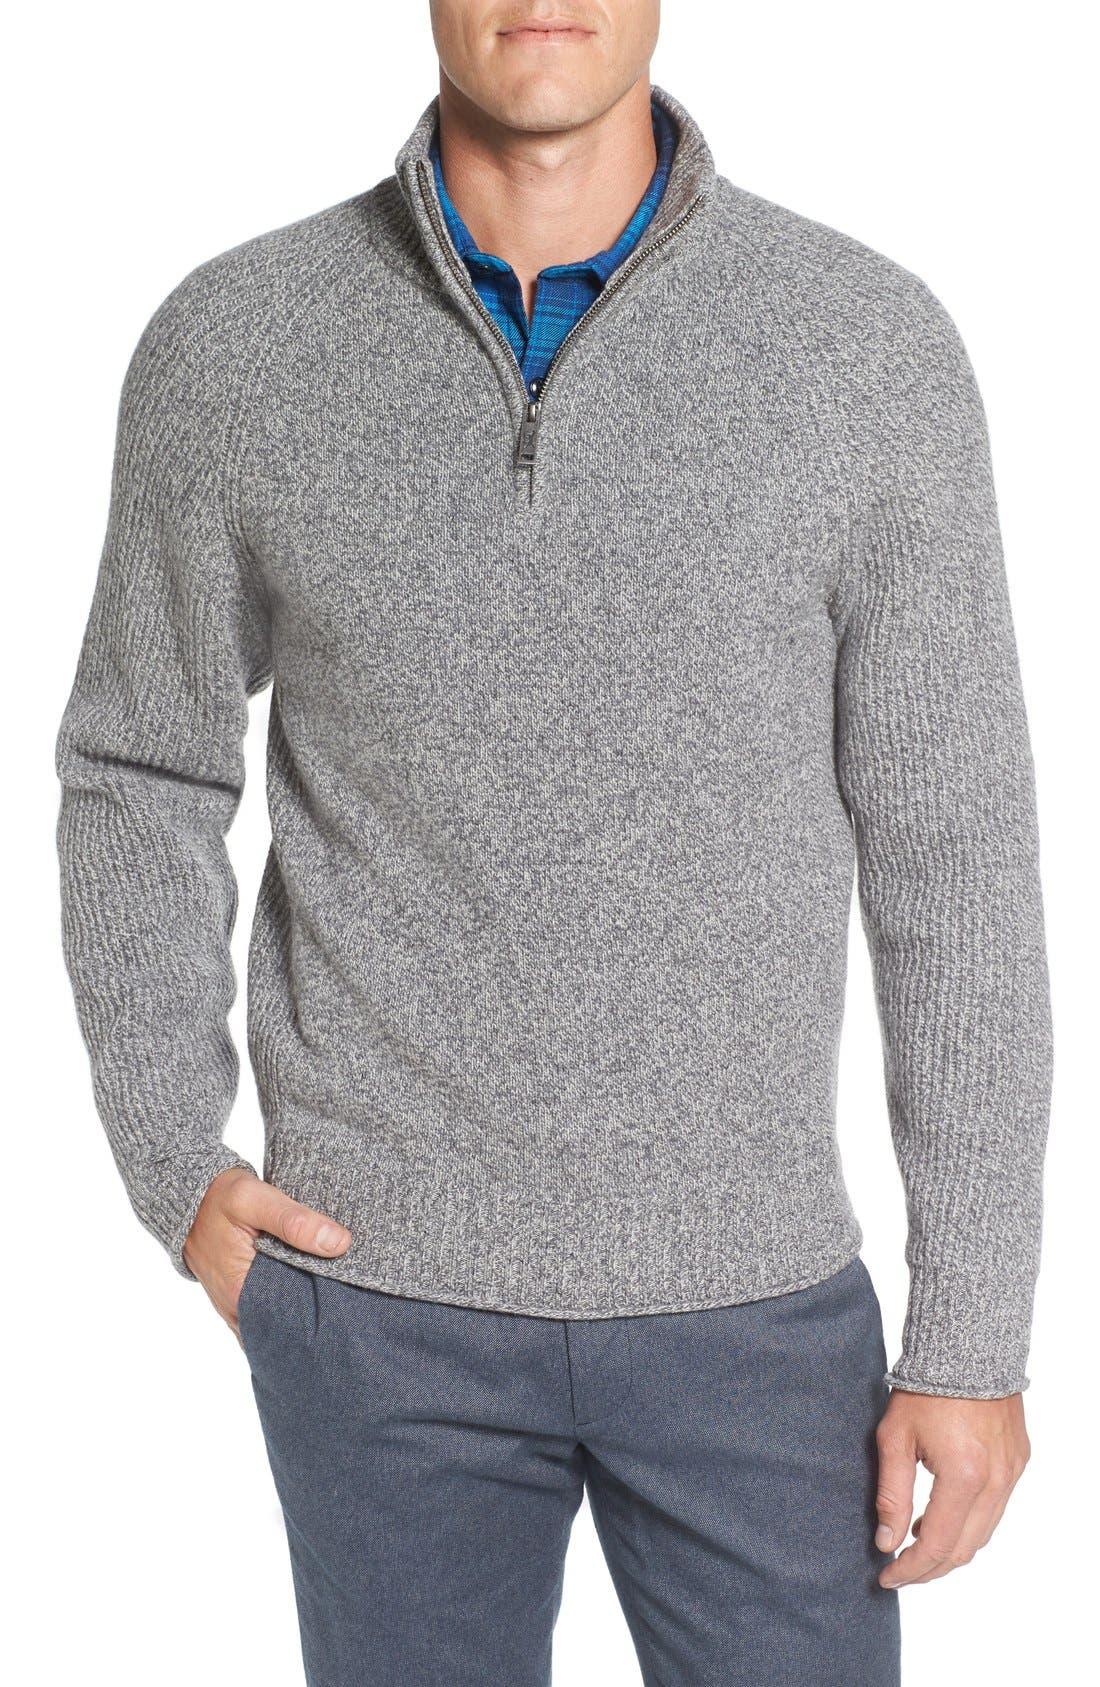 Rodd & Gunn Stredwick Lambswool Sweater